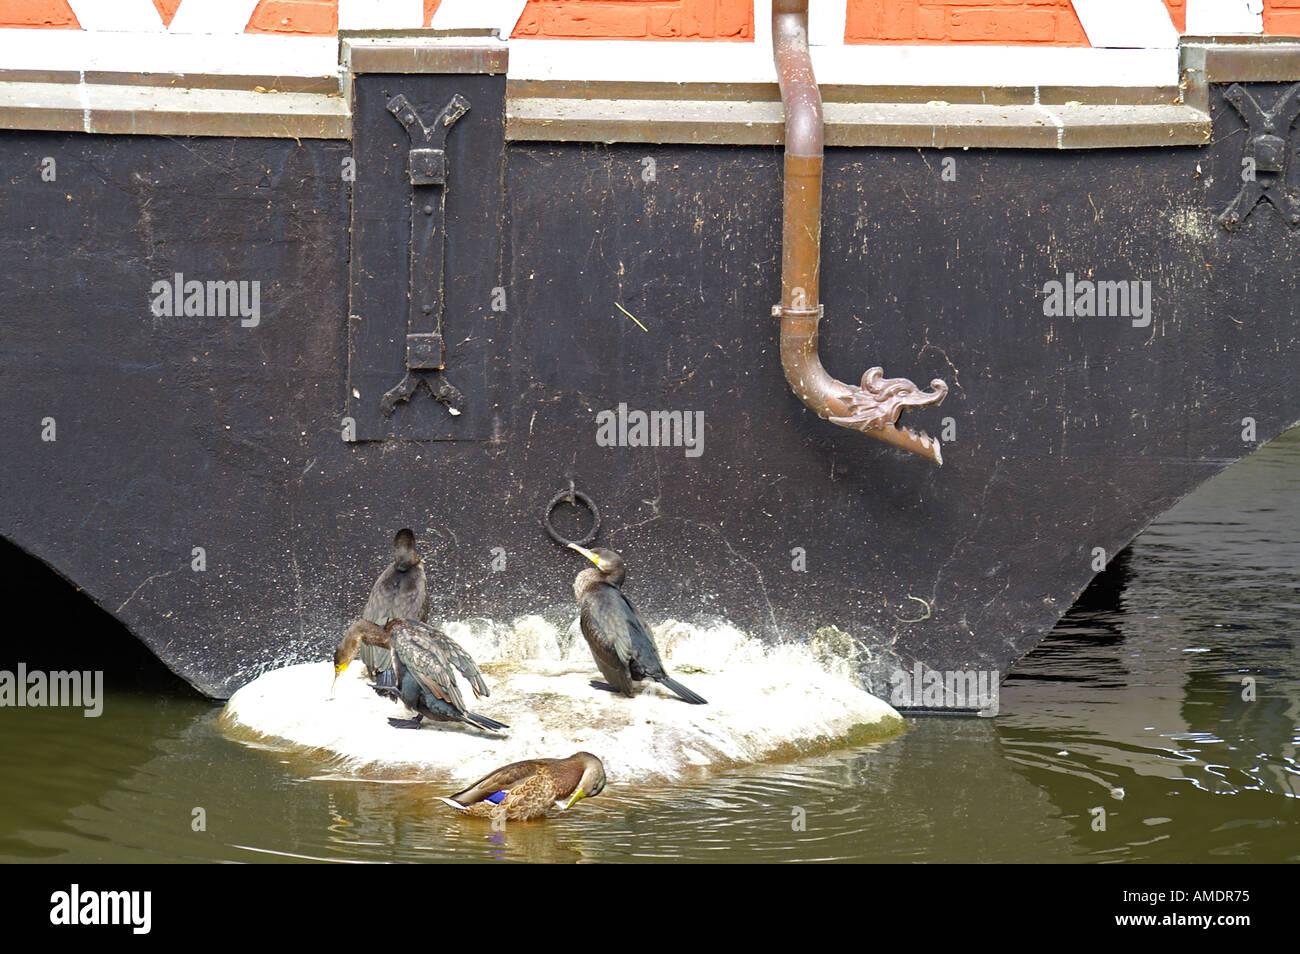 Kormorane Ente Cormorant duck - Stock Image